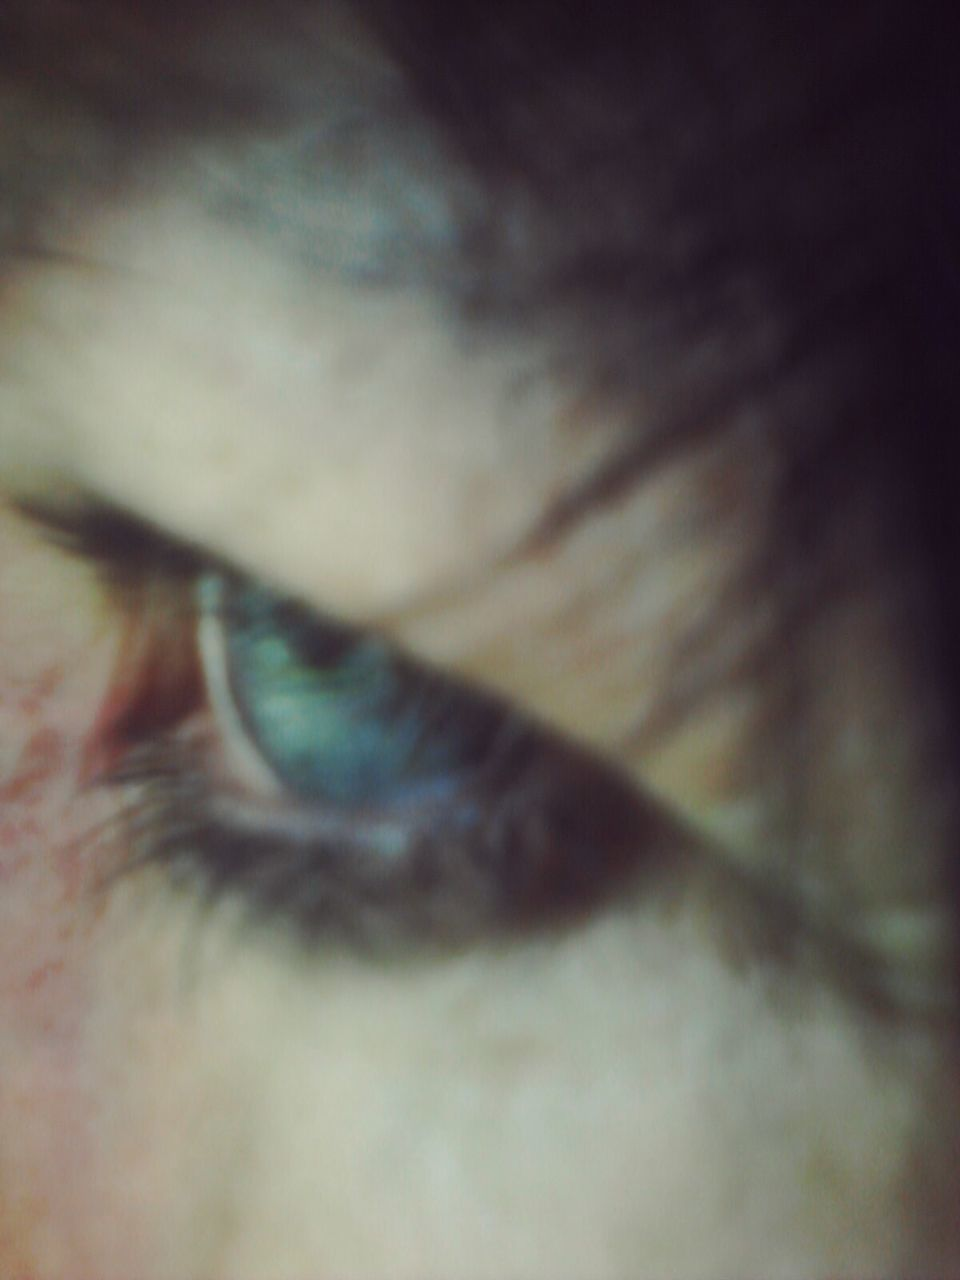 human eye, human body part, one person, eyesight, eyelash, sensory perception, real people, close-up, human skin, full frame, eyeball, iris - eye, backgrounds, day, eyebrow, indoors, people